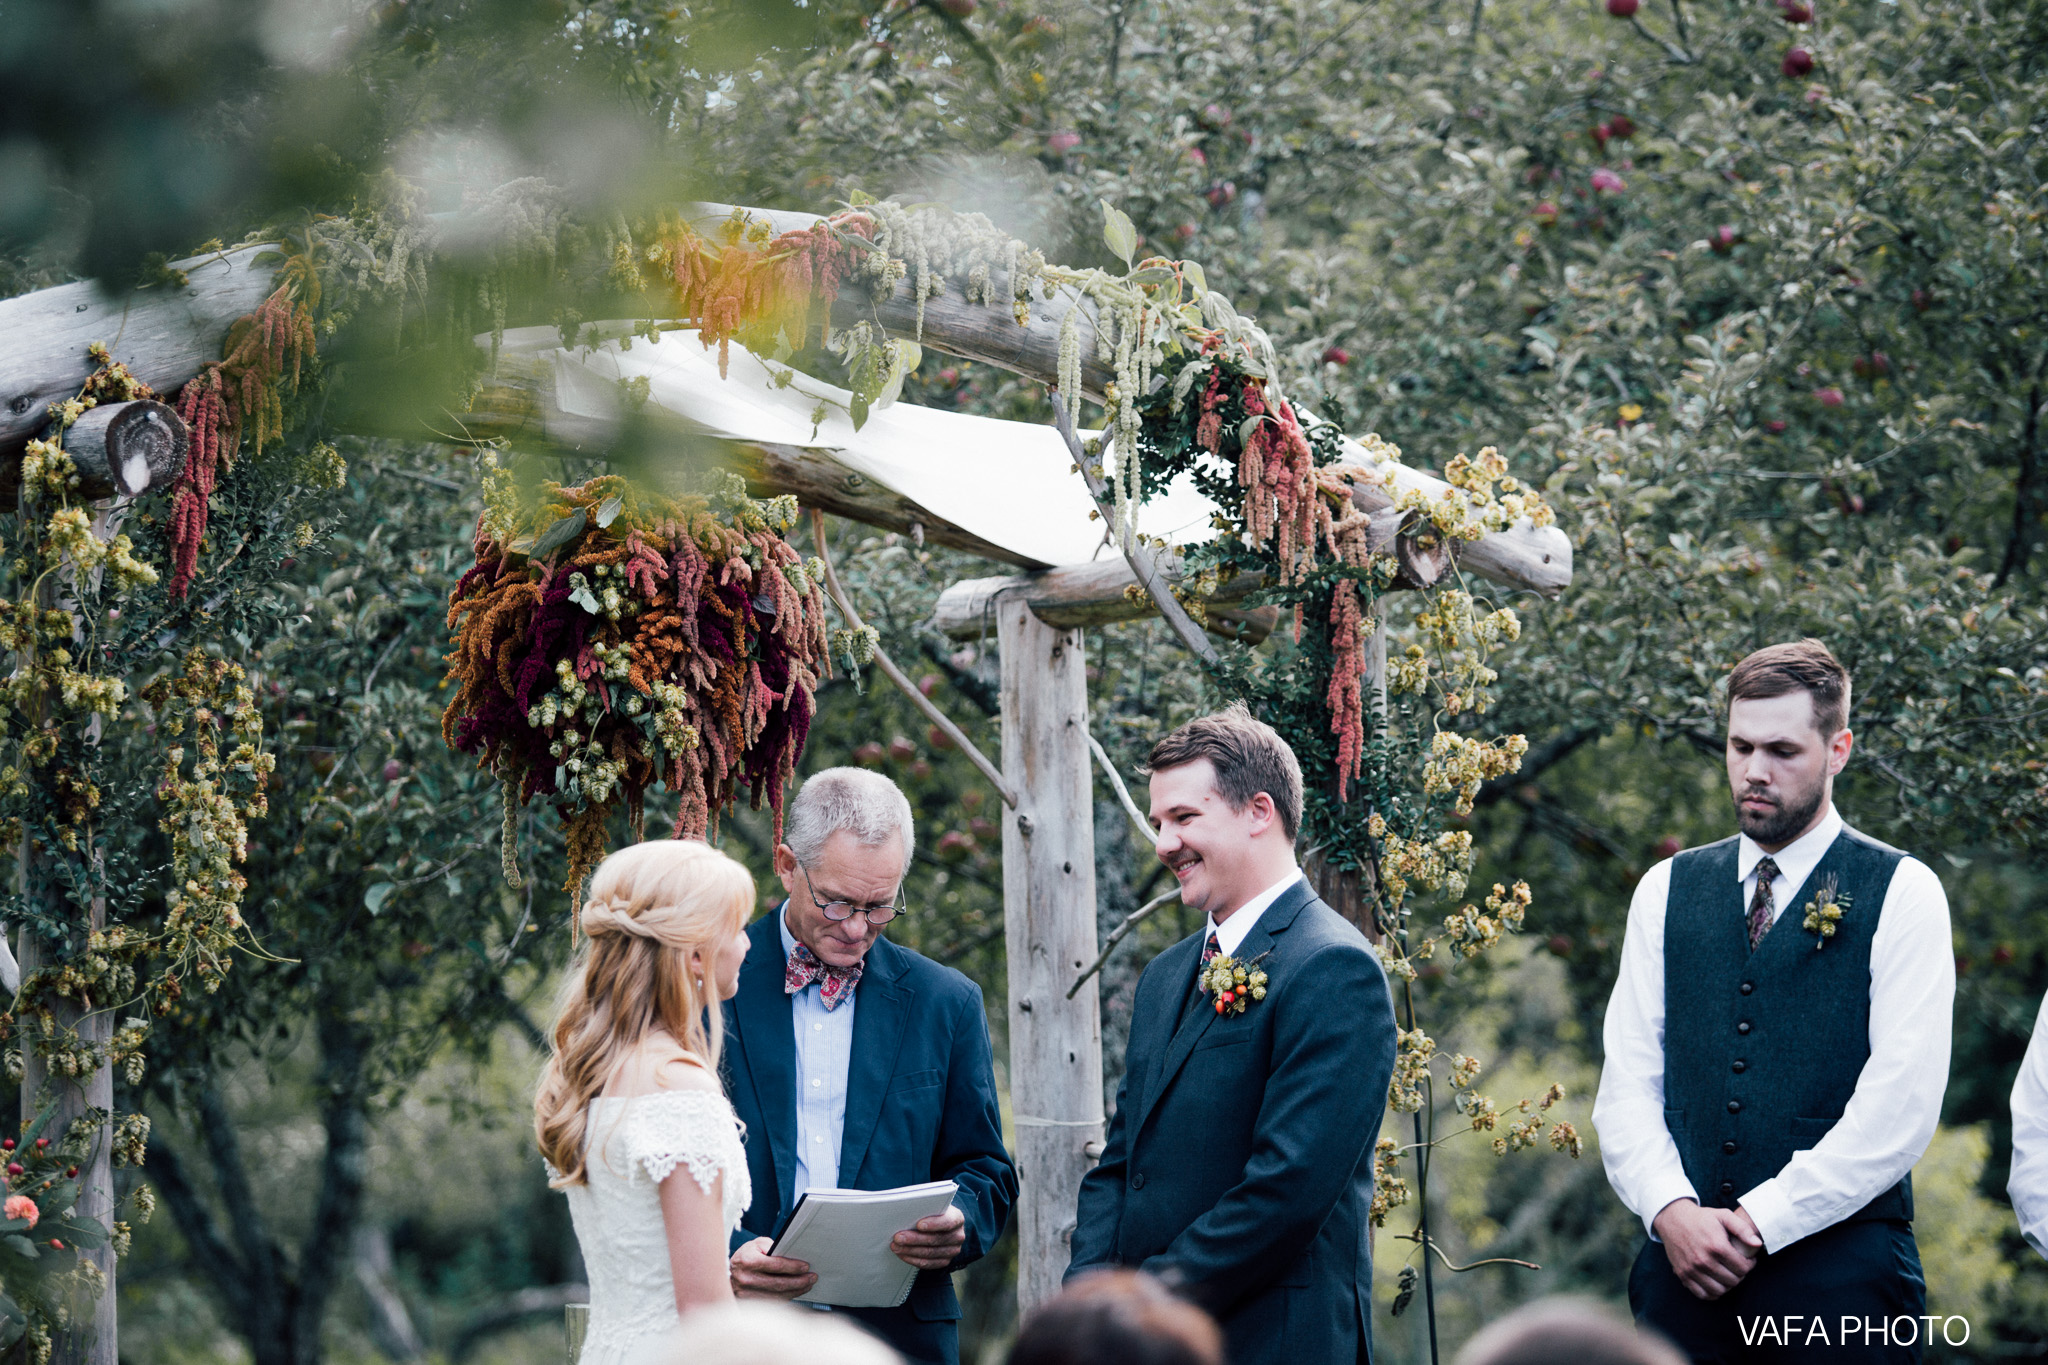 Belsolda-Farm-Wedding-Christy-Eric-Vafa-Photo-469.jpg